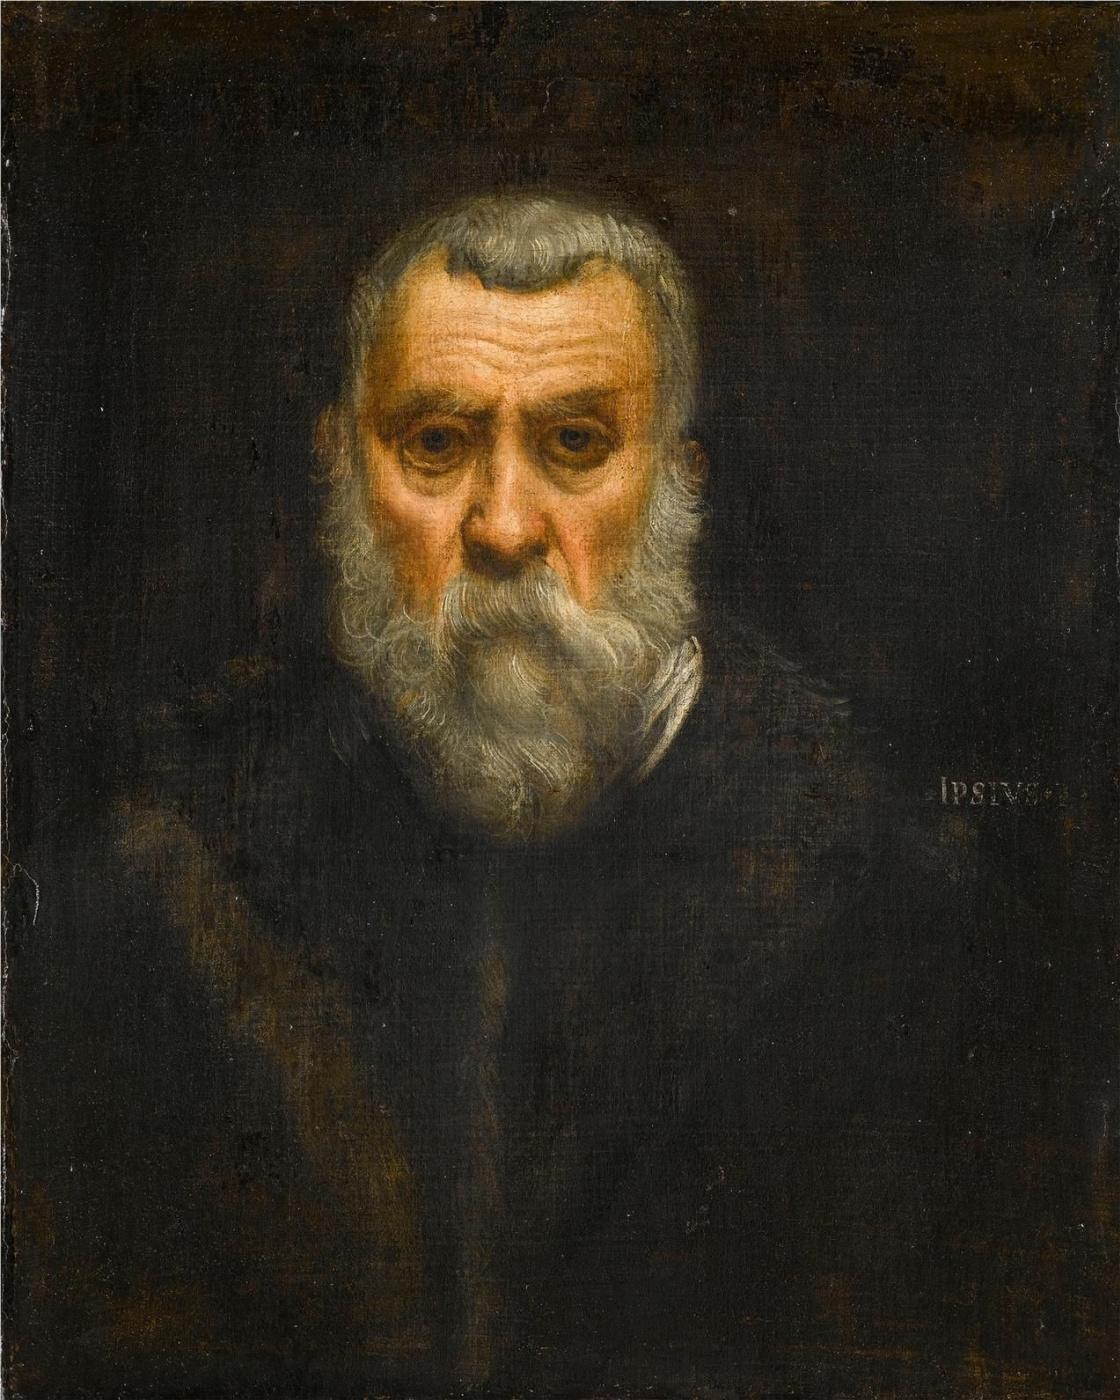 Jacopo (Robusti) Tintoretto. Self-portrait